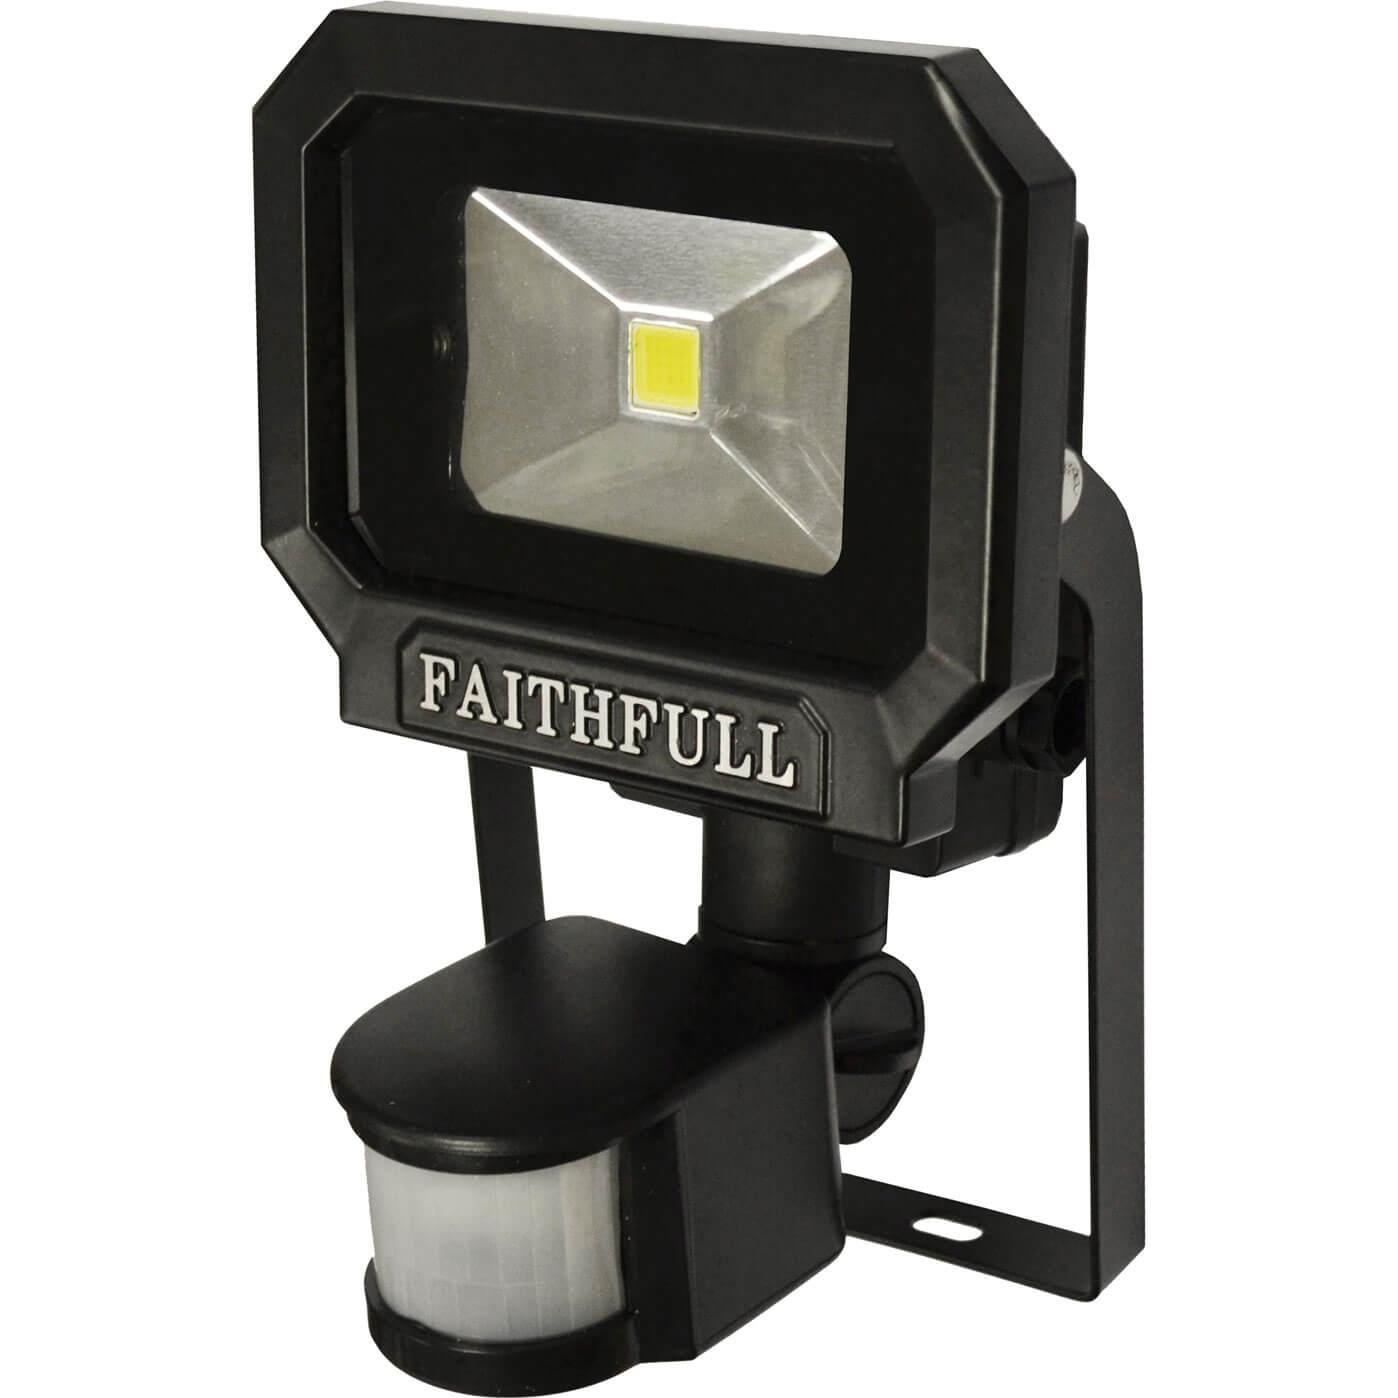 Image of Faithfull COB LED Security Floodlight PIR Motion Detector 10w 650 Lumens 240v